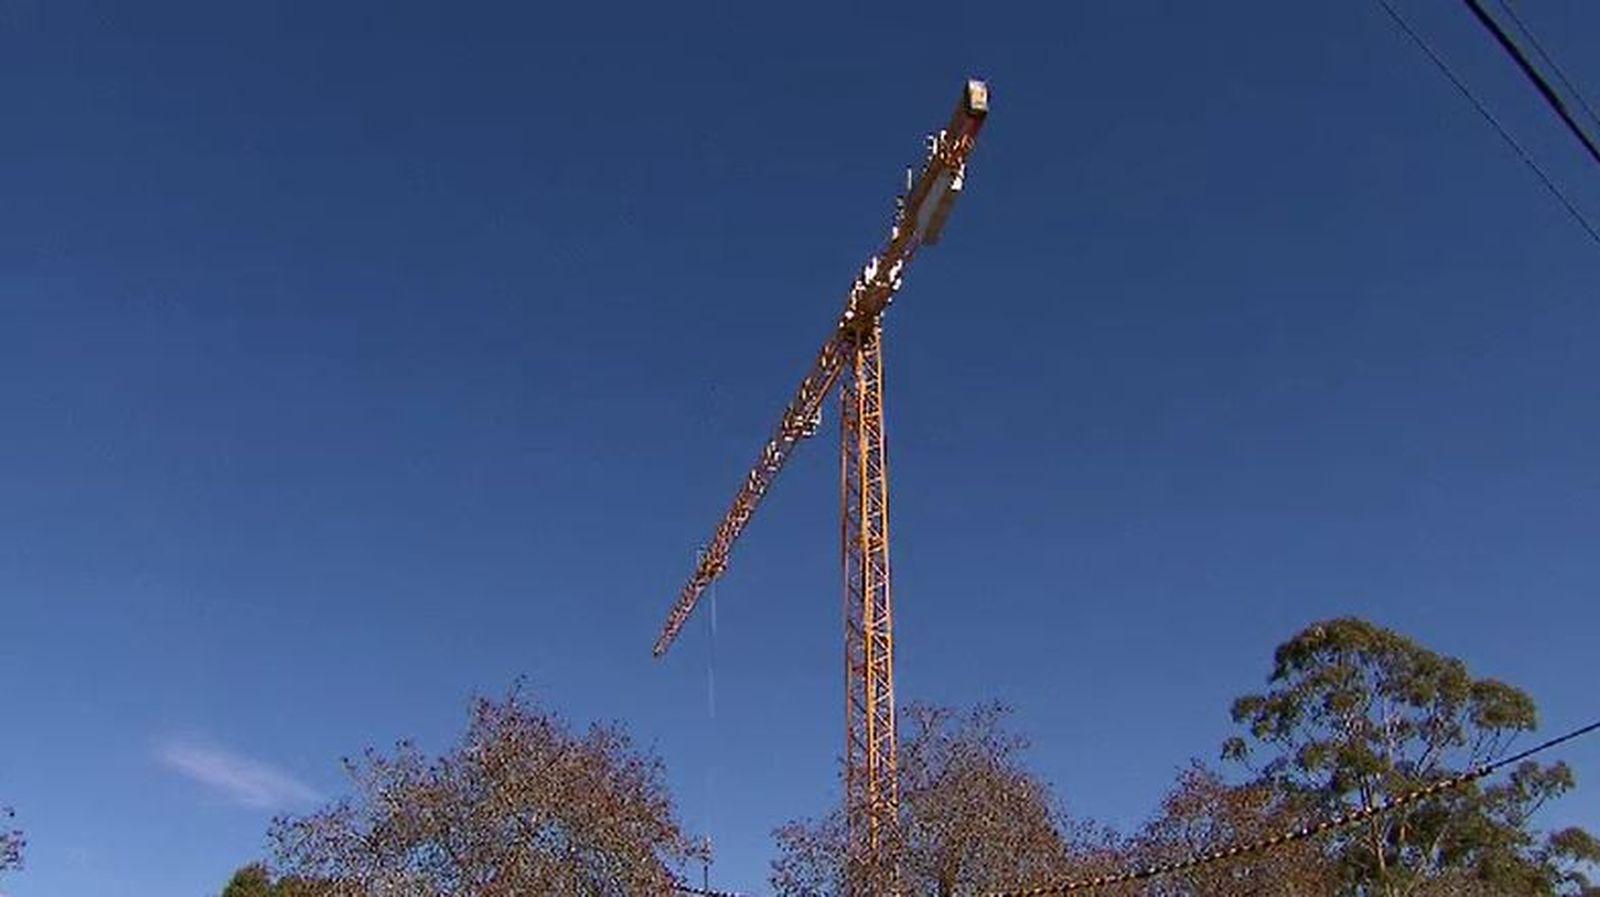 Crane on site.